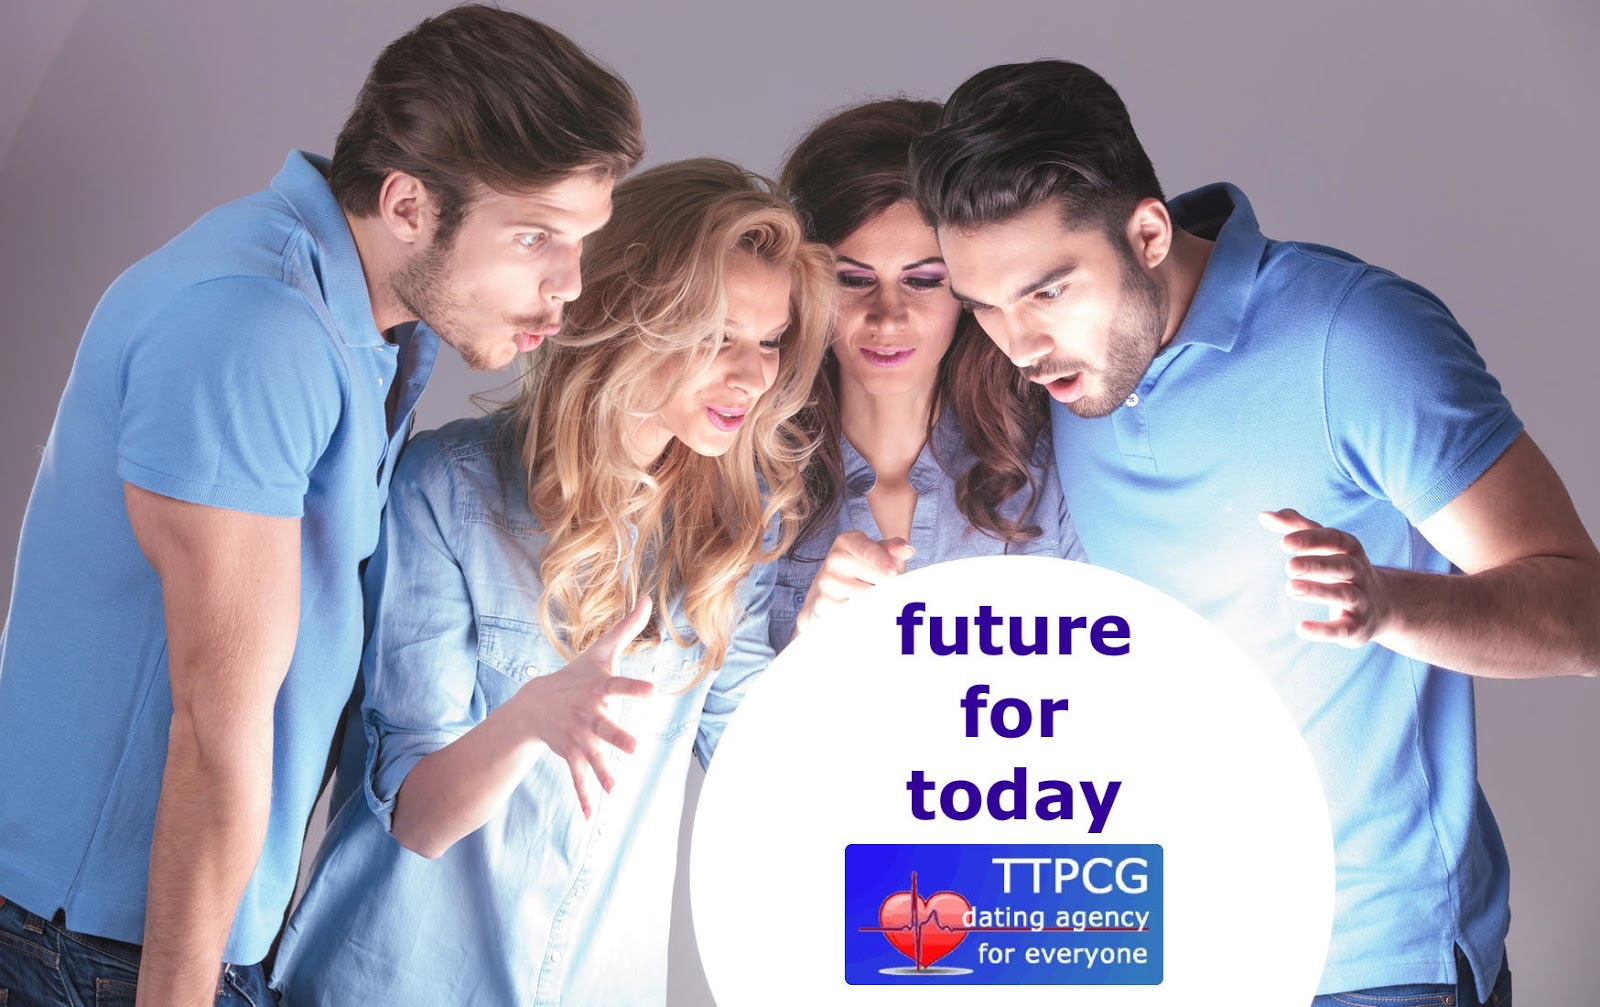 ttpcg dating Agency Inc